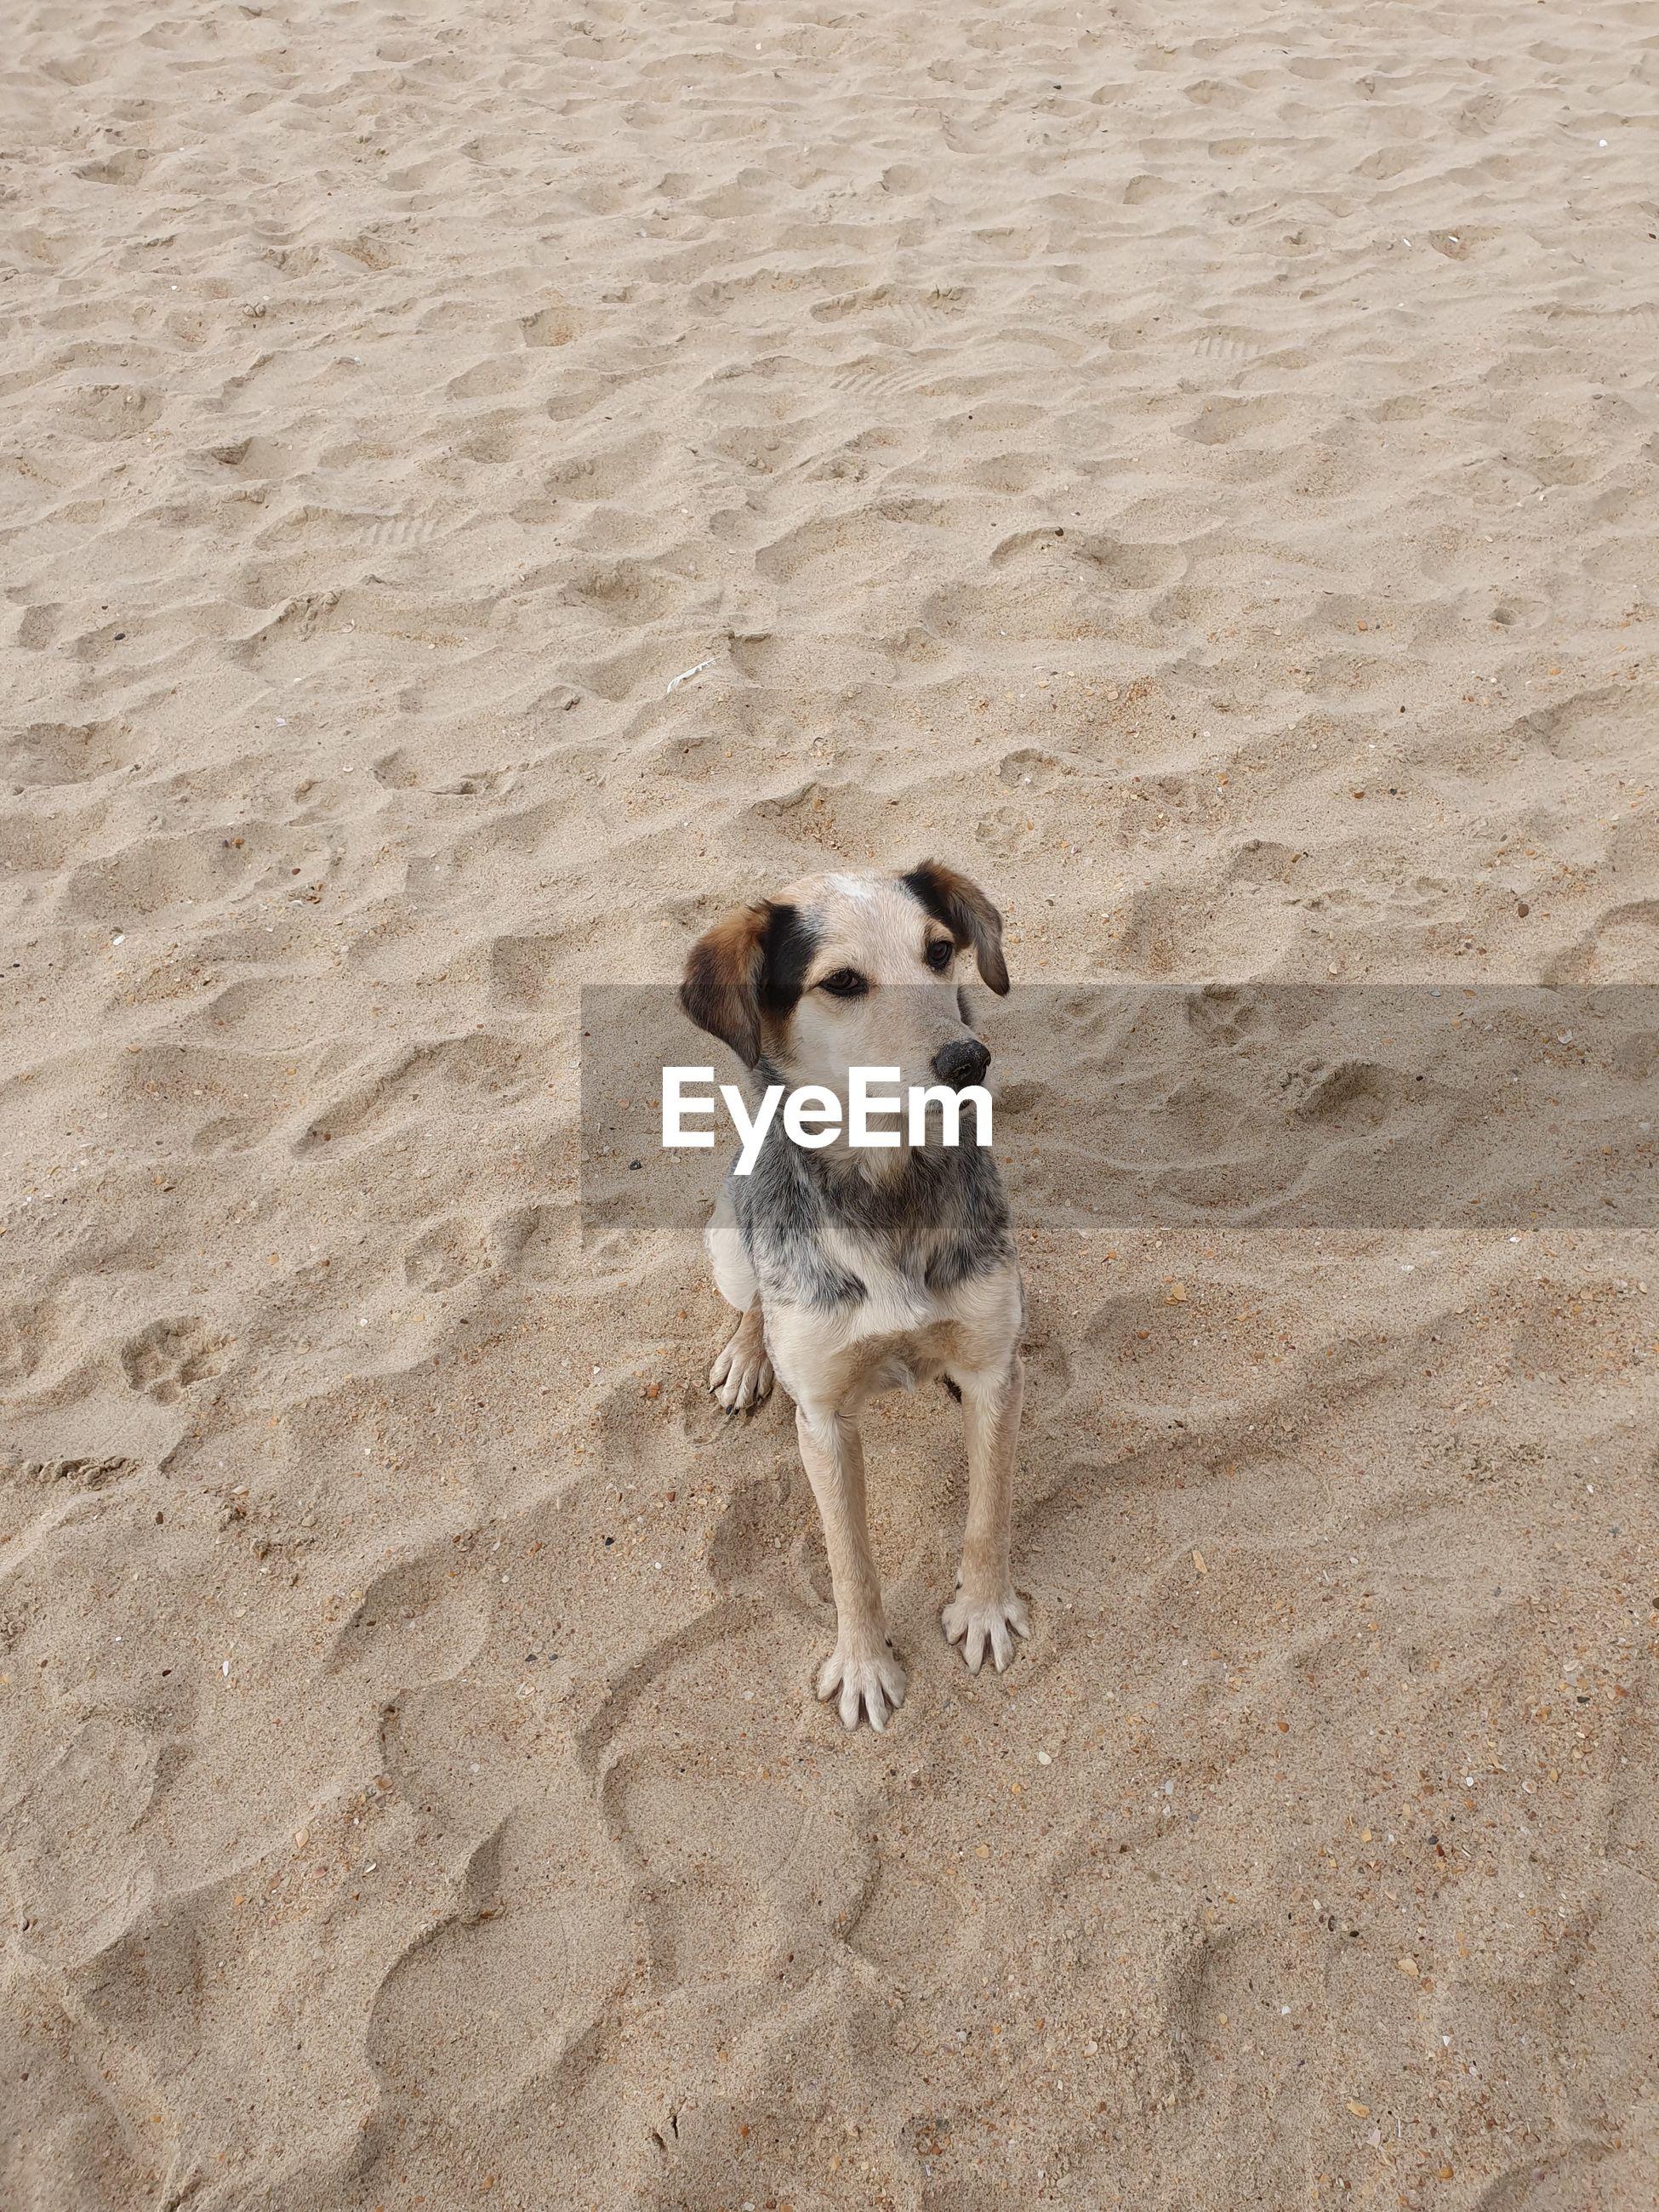 HIGH ANGLE PORTRAIT OF DOG ON SAND